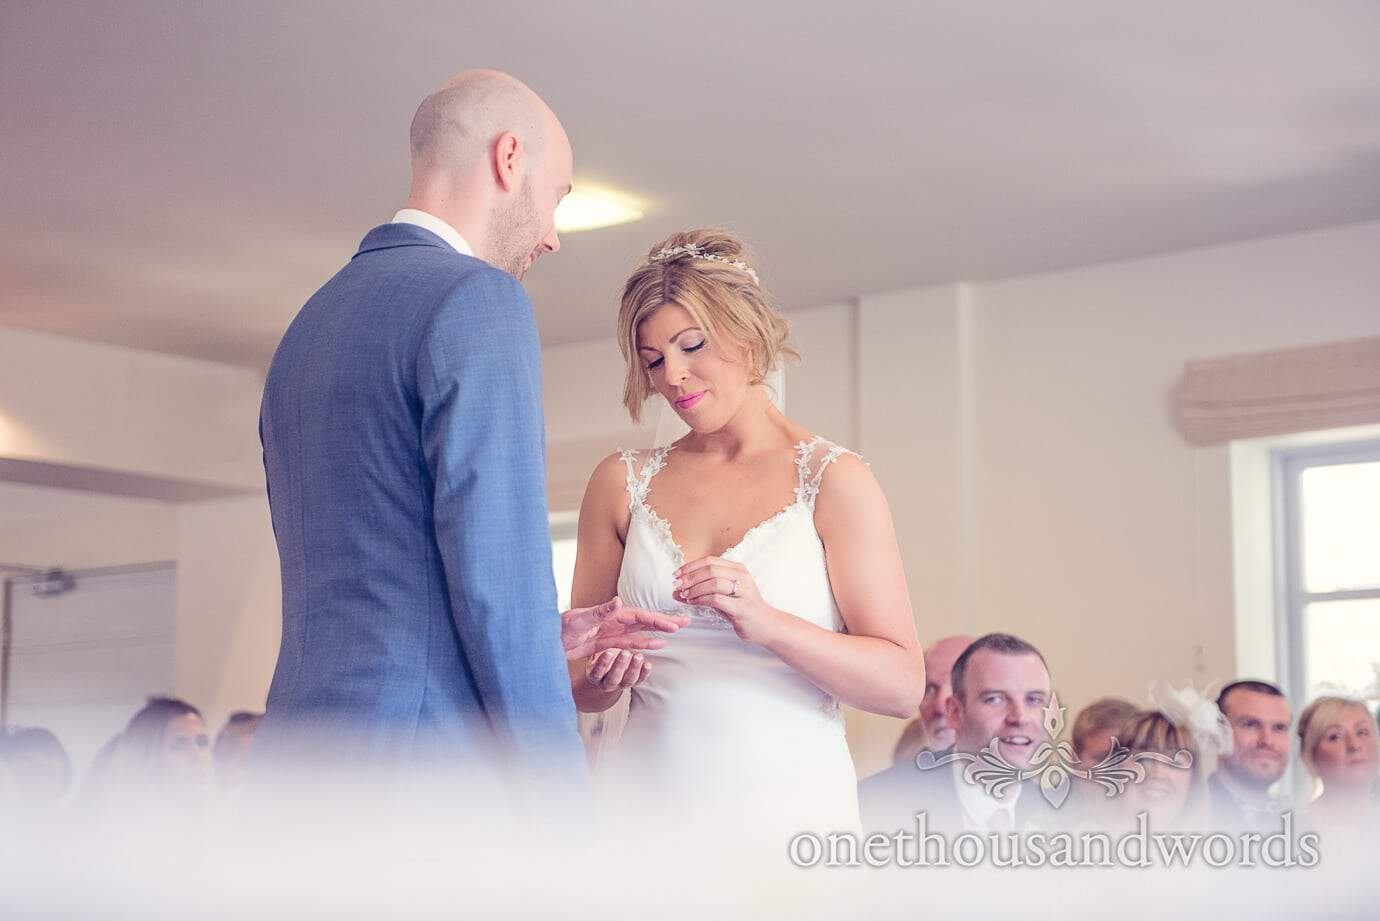 Exchange of rings at Italian Villa Wedding Photographs